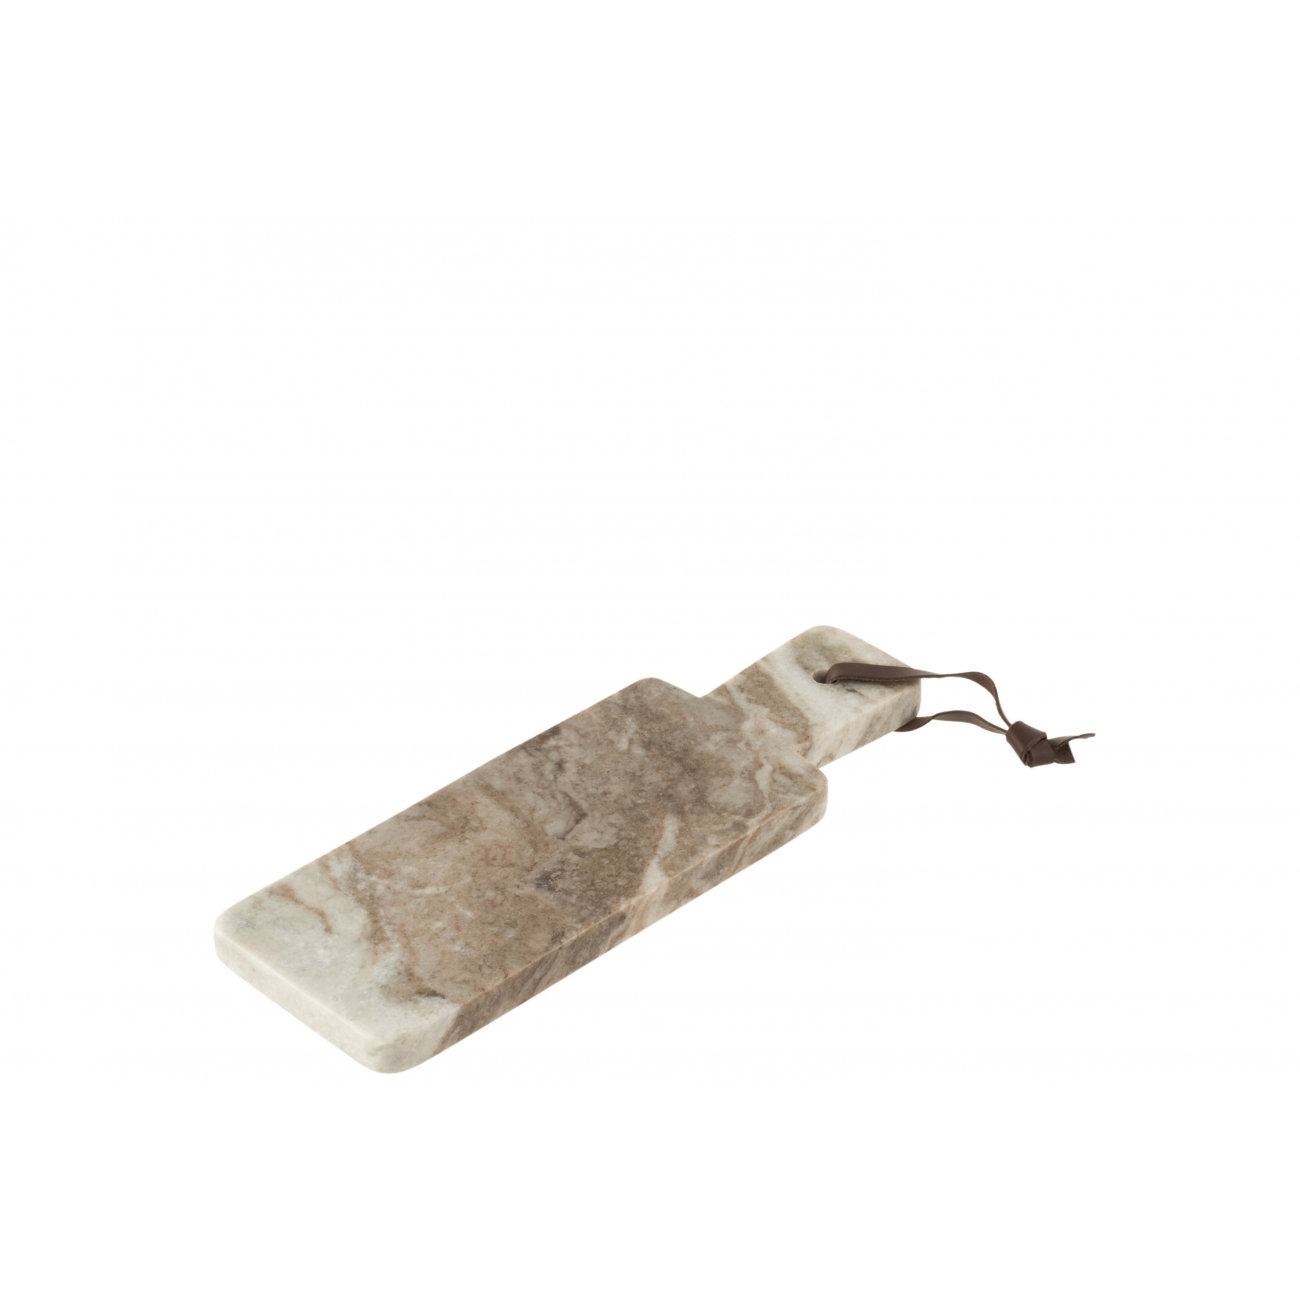 Доска для сервировки J-LINE каменная бежевого цвета 30х10 см Бельгия